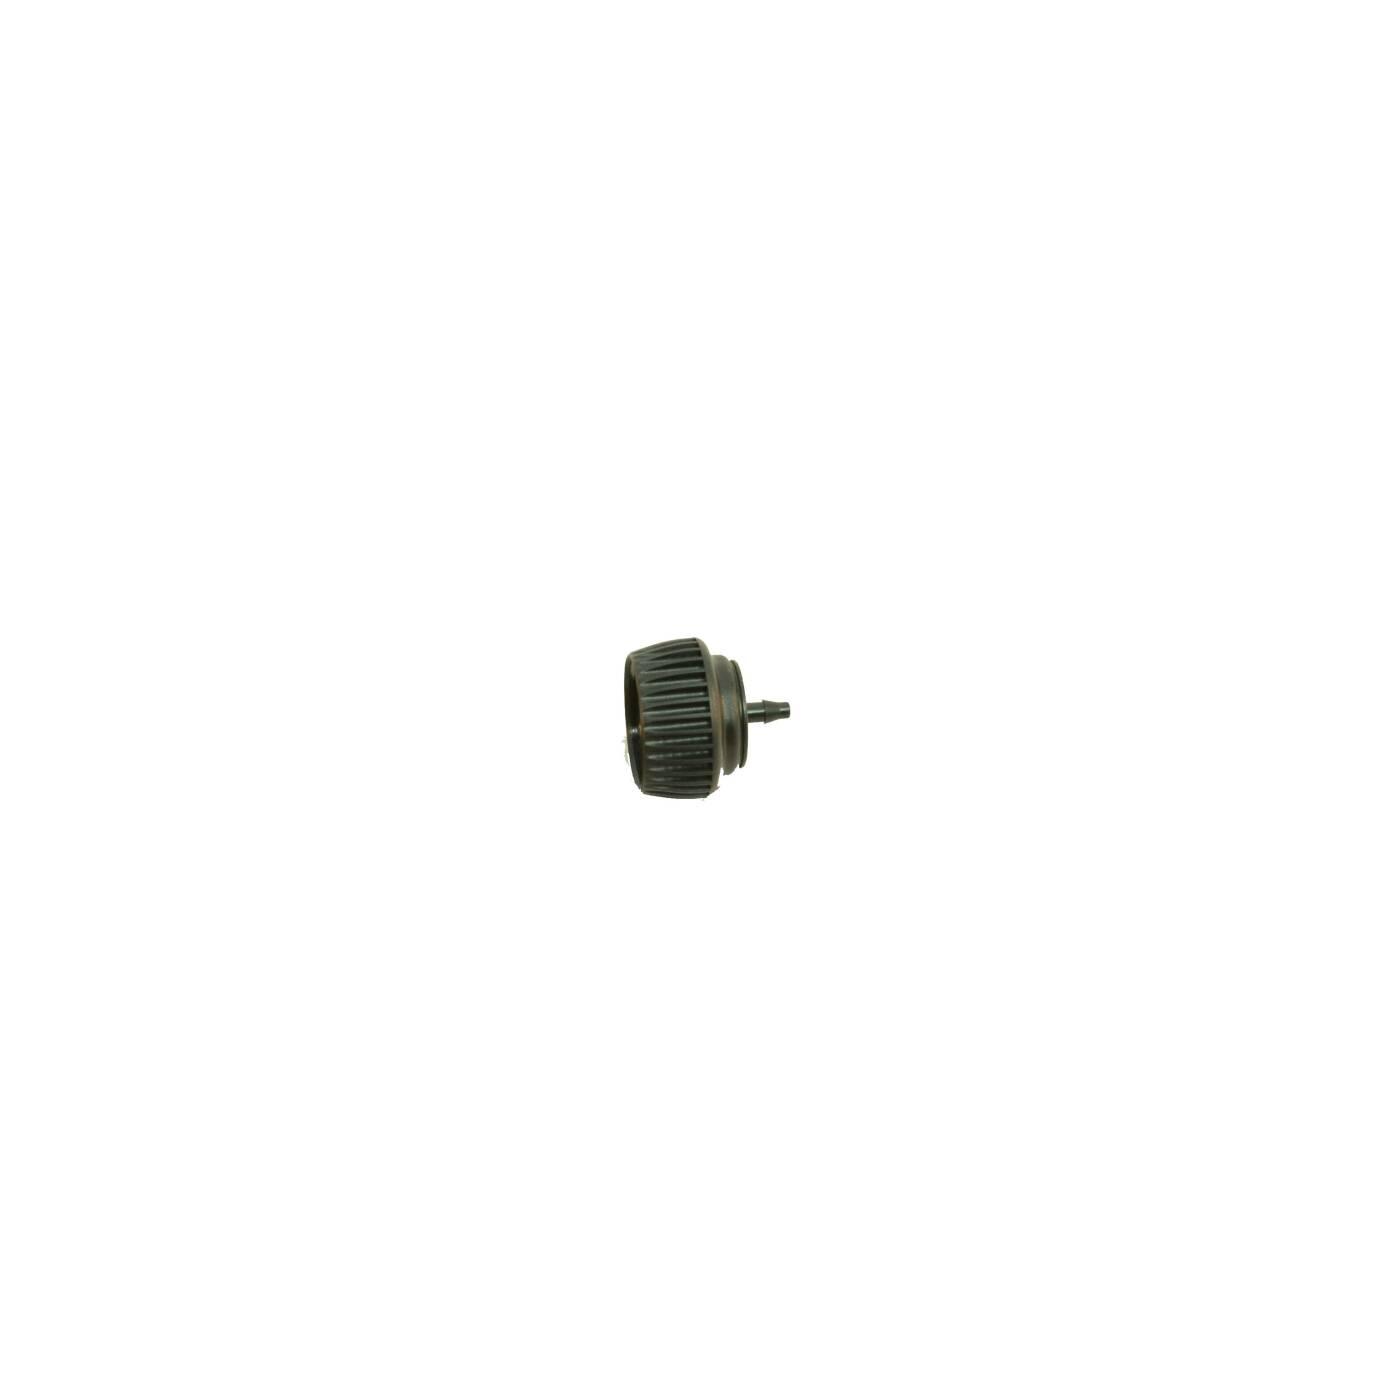 Micro Bewässerung X 5 Bewässerung in Linie Ventil 5mm